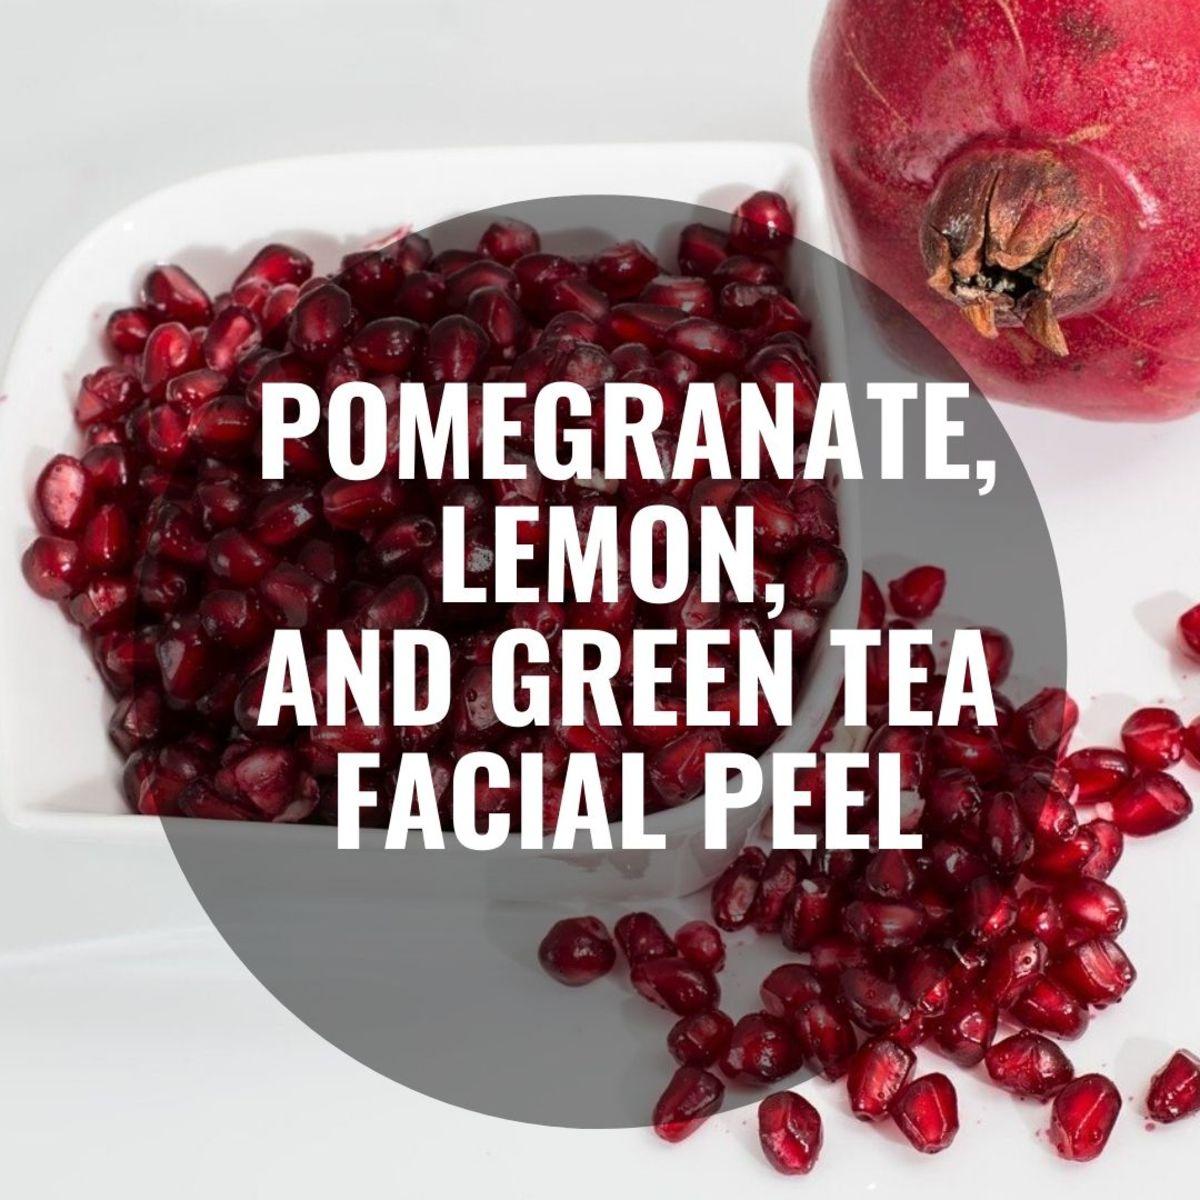 Pomegranate, Lemon, and Green Tea Facial Peel